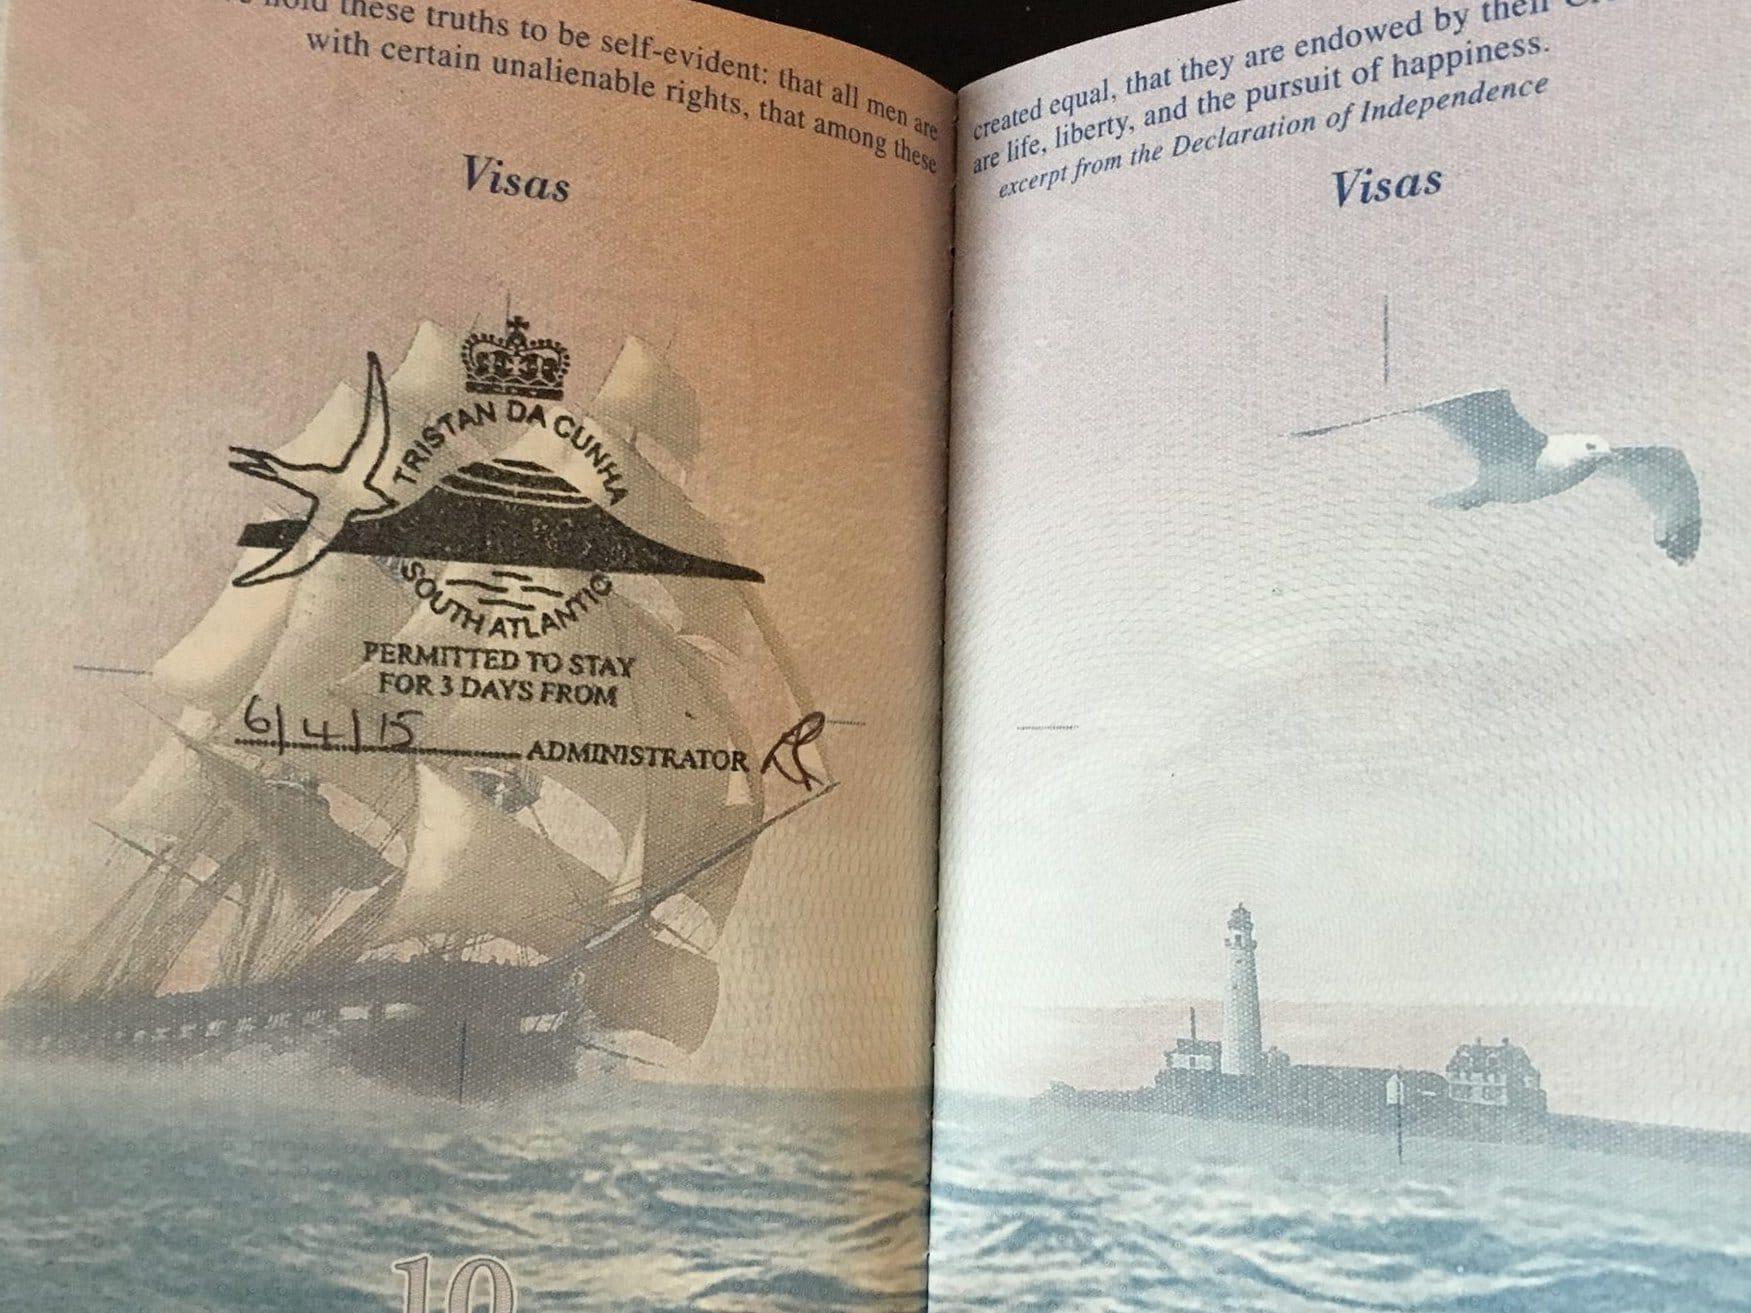 Tampon de passeport de Tristan da Cunha